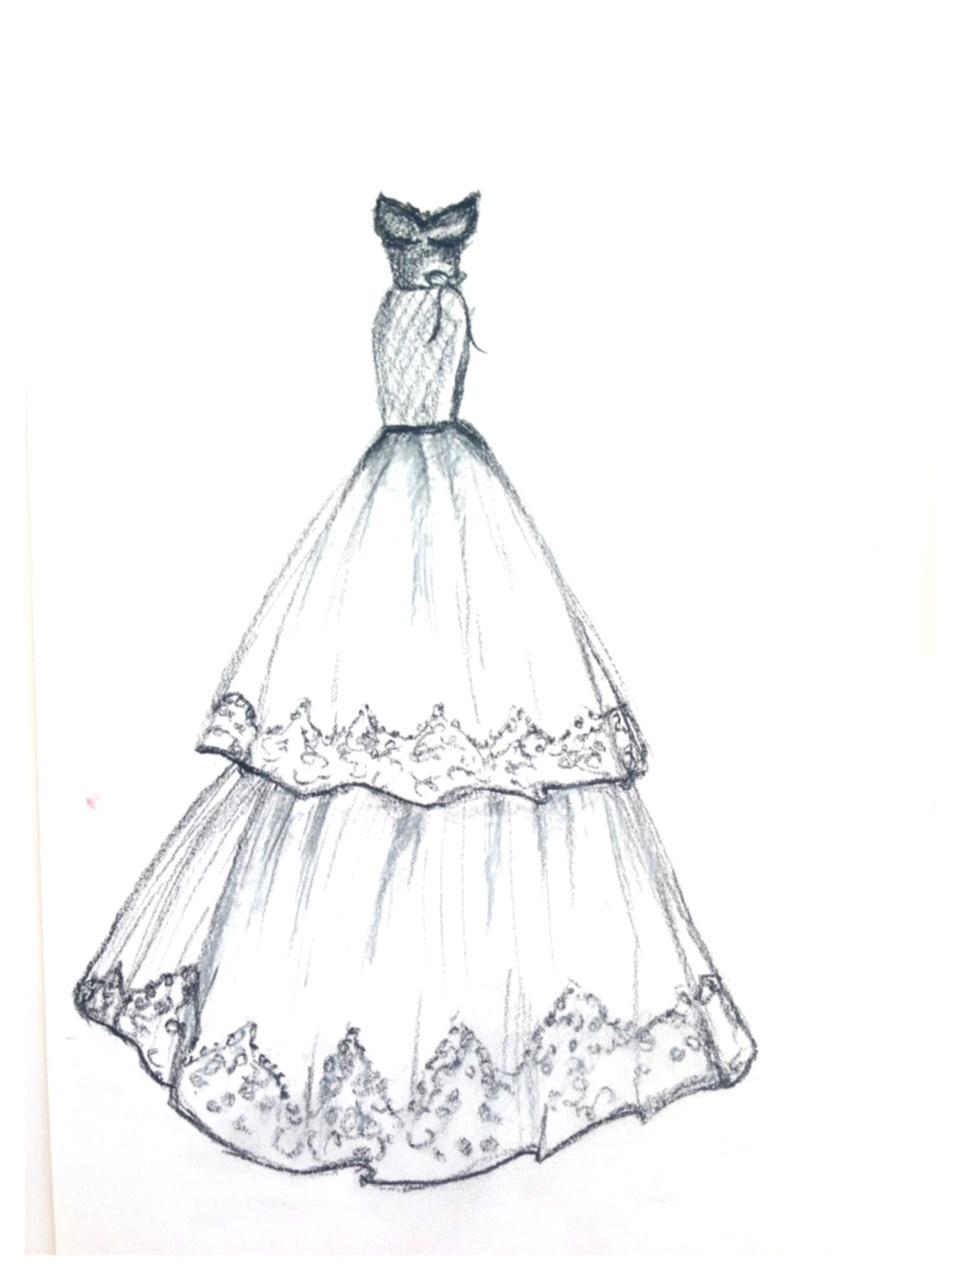 960x1280 Dress Designs Drawings